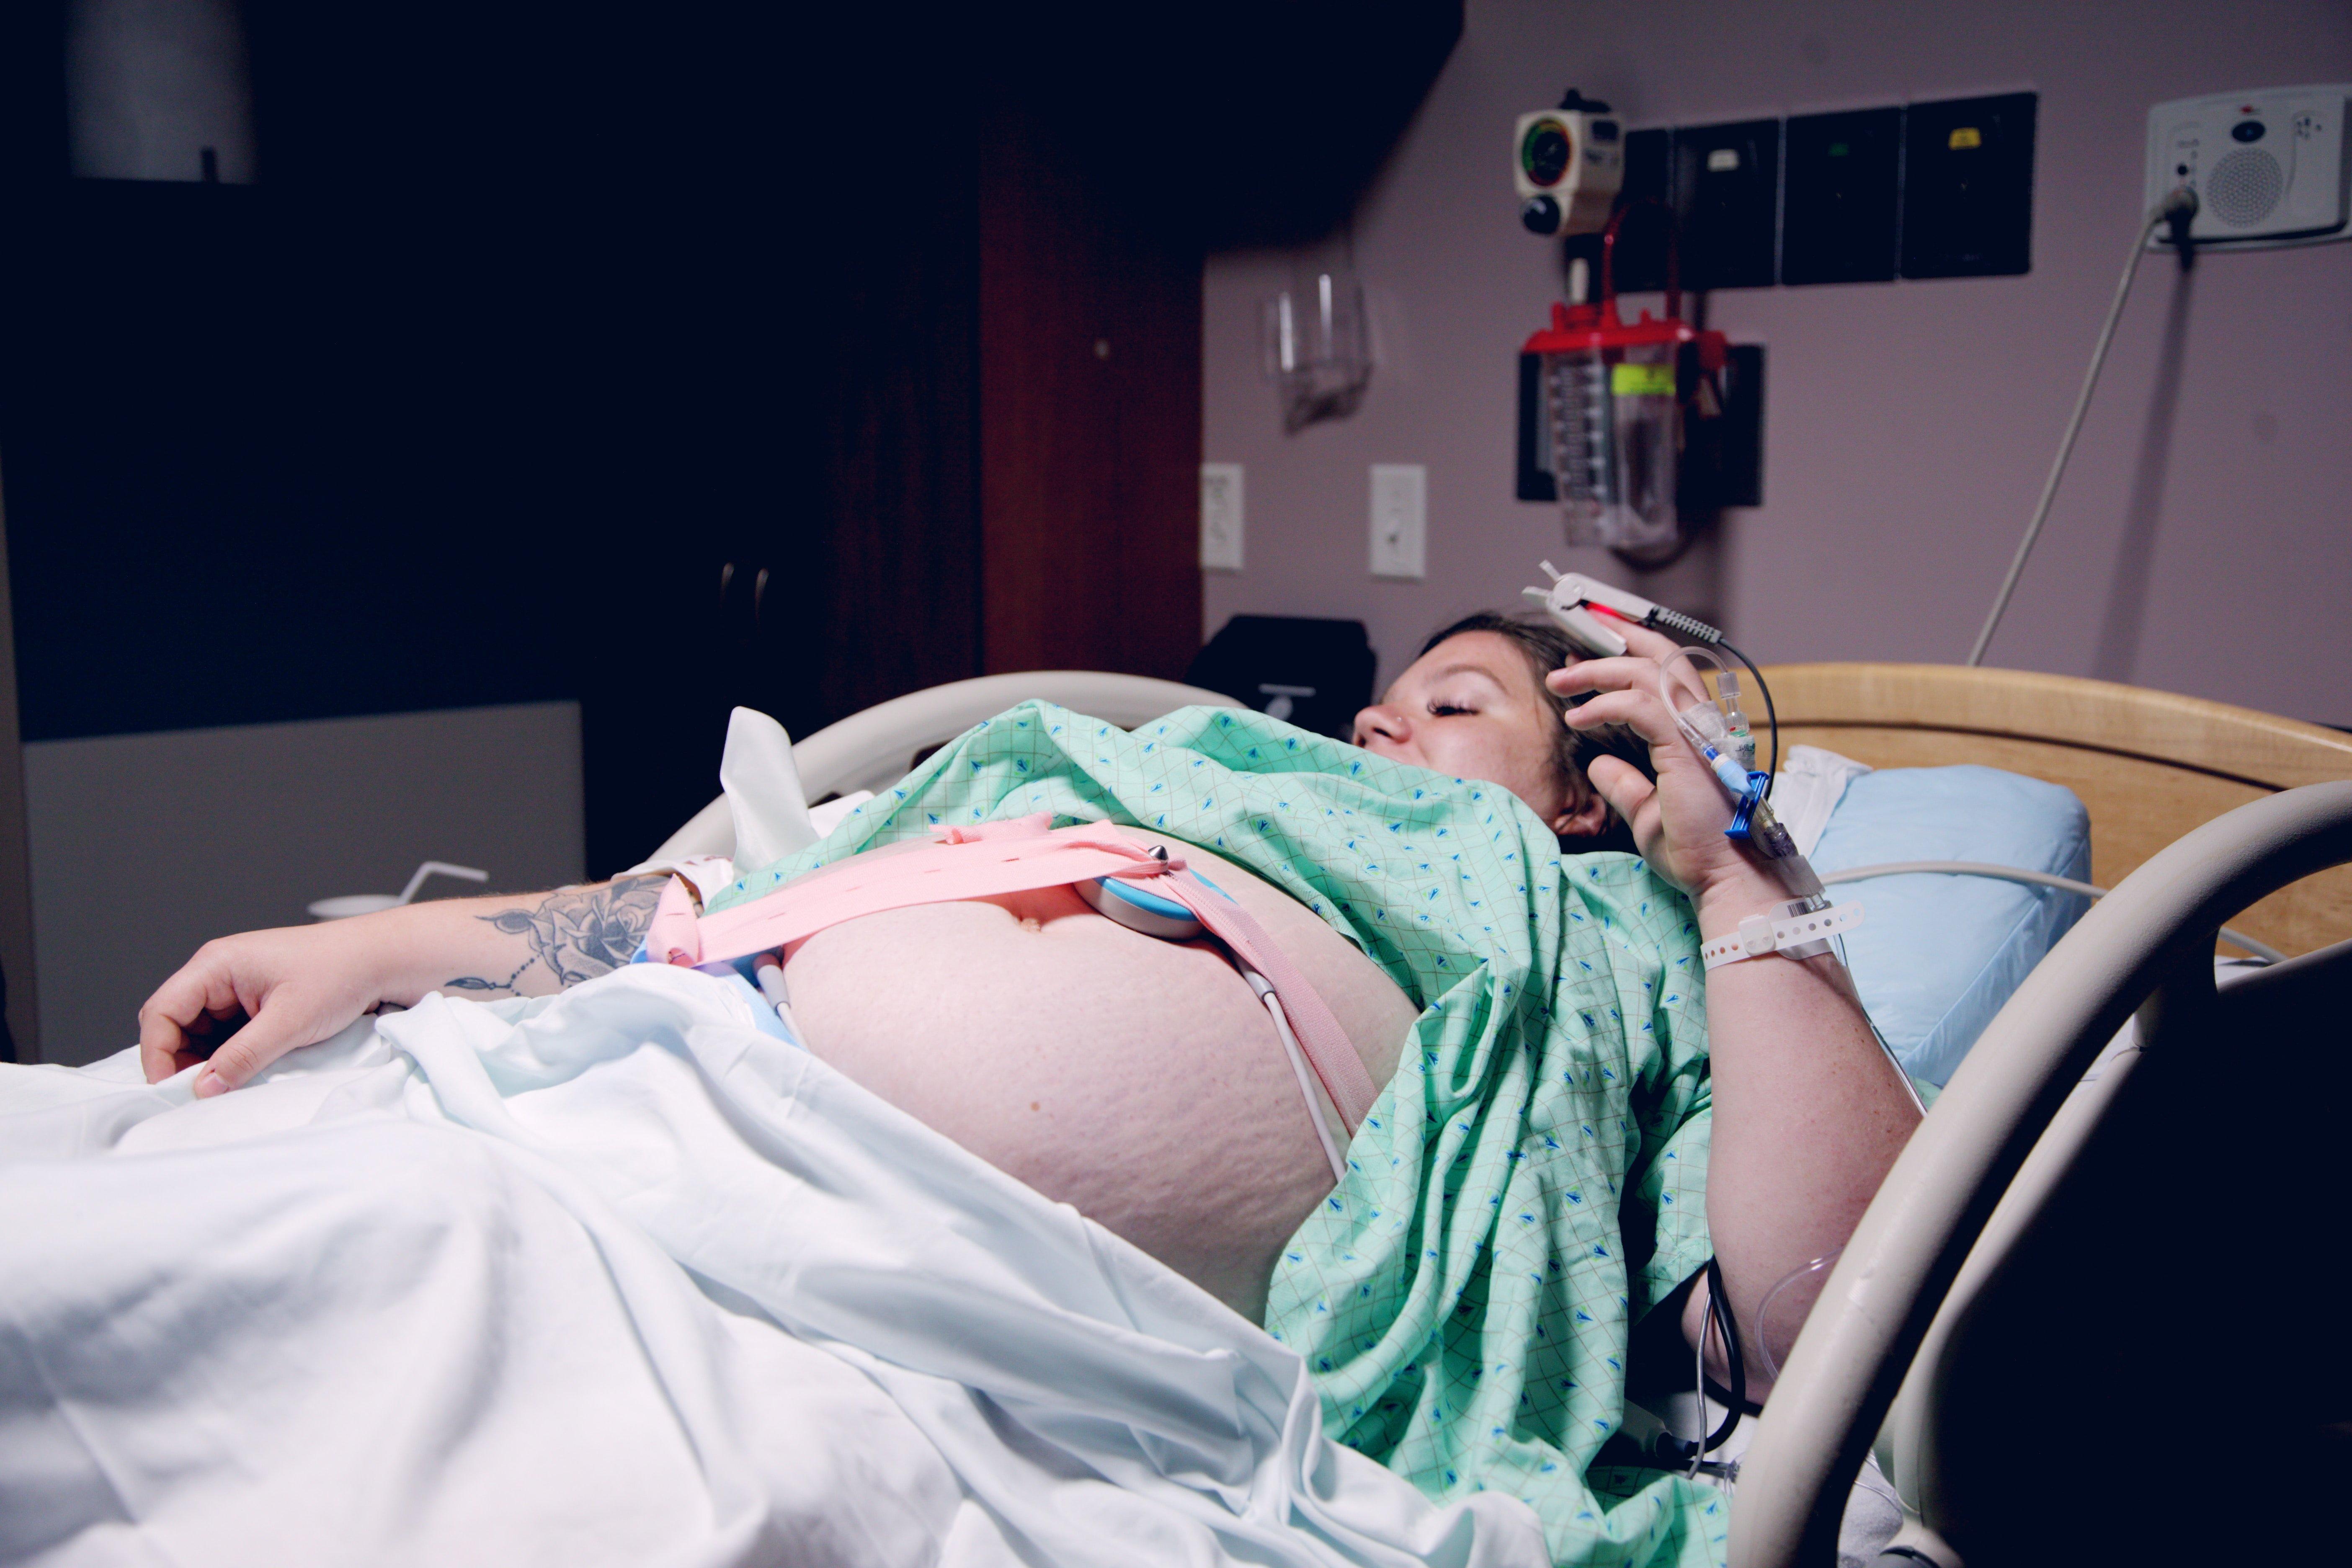 A pregnant woman on a hospital bed | Source: Unsplash.com